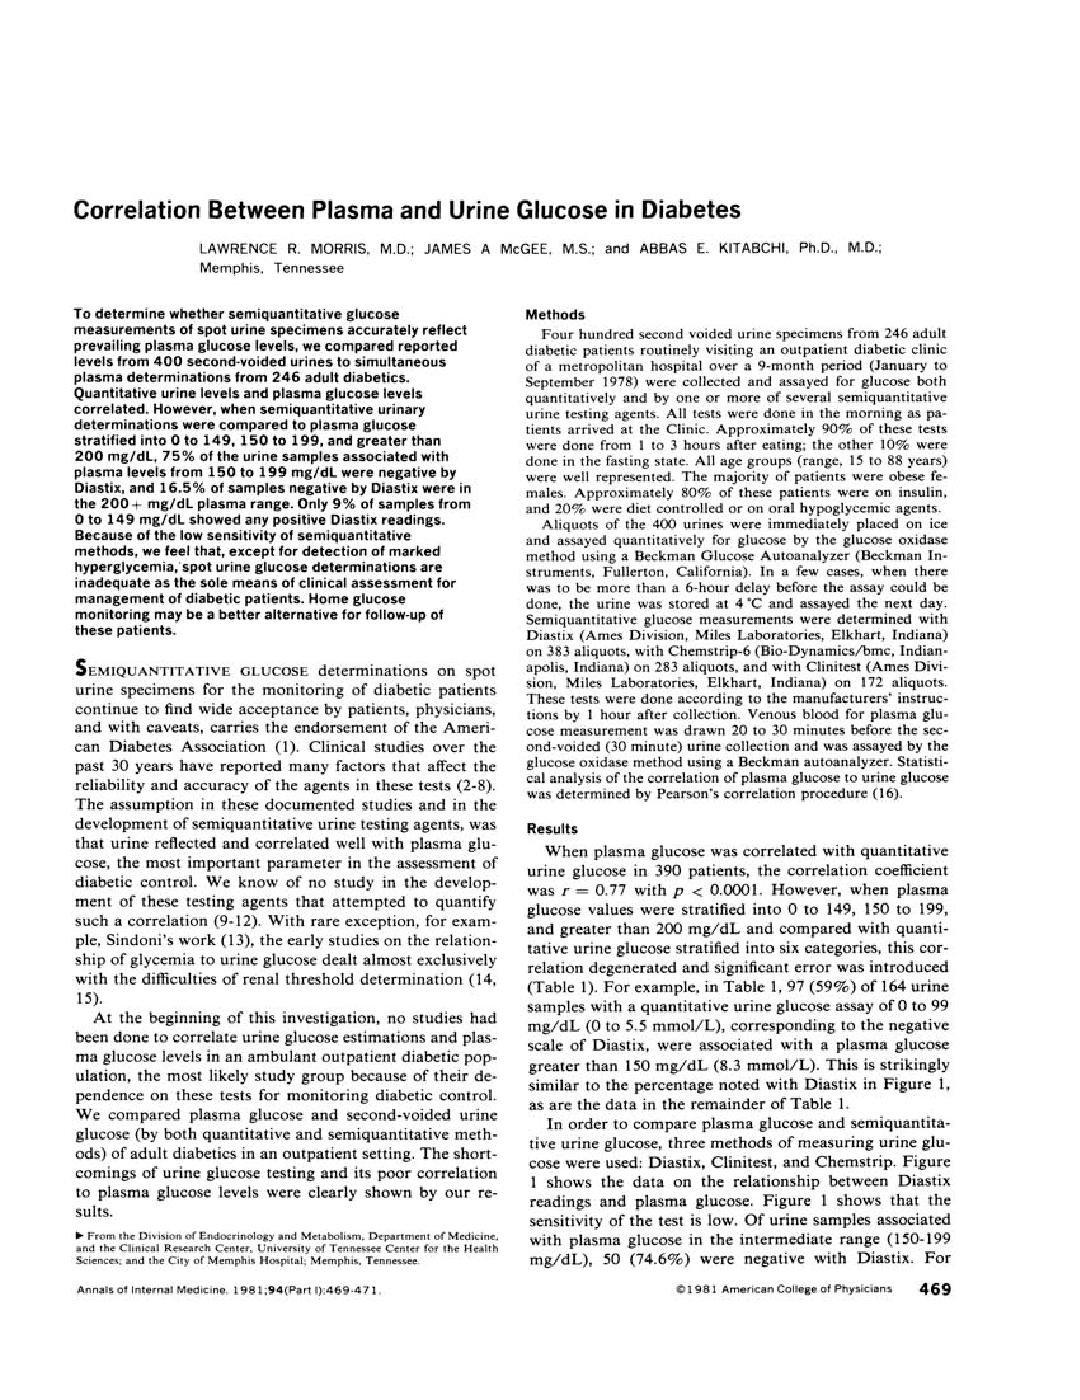 Correlation Between Plasma And Urine Glucose In Diabetes